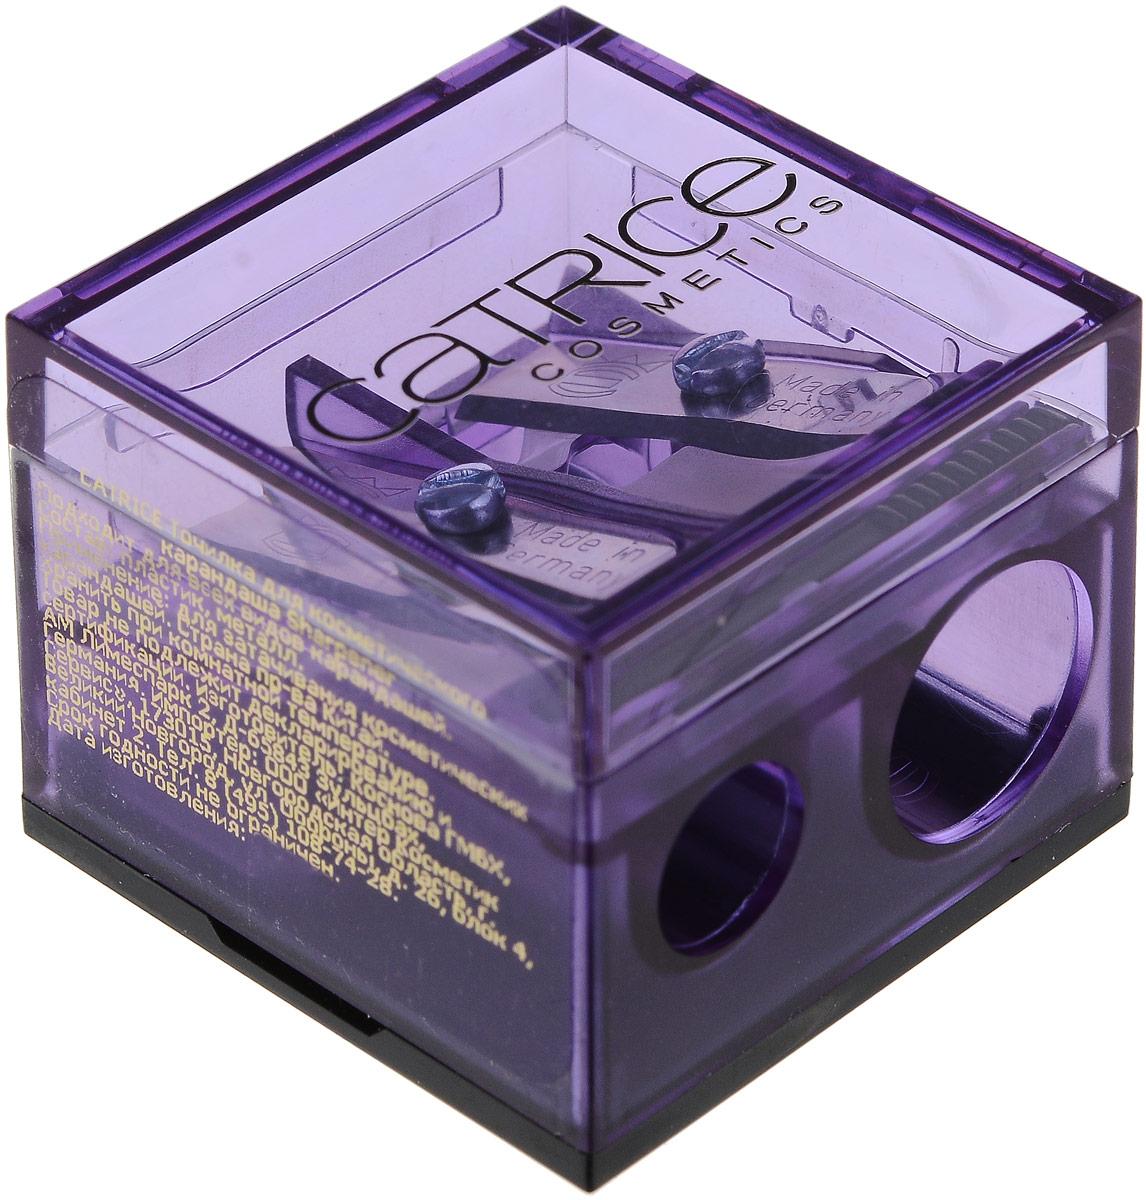 Catrice Точилка для косметического карандаша Sharpener 2 гр, цвет: фиолетовый28032022Catrice Точилка для косметического карандаша Sharpener 2 гр, цвет: фиолетовый